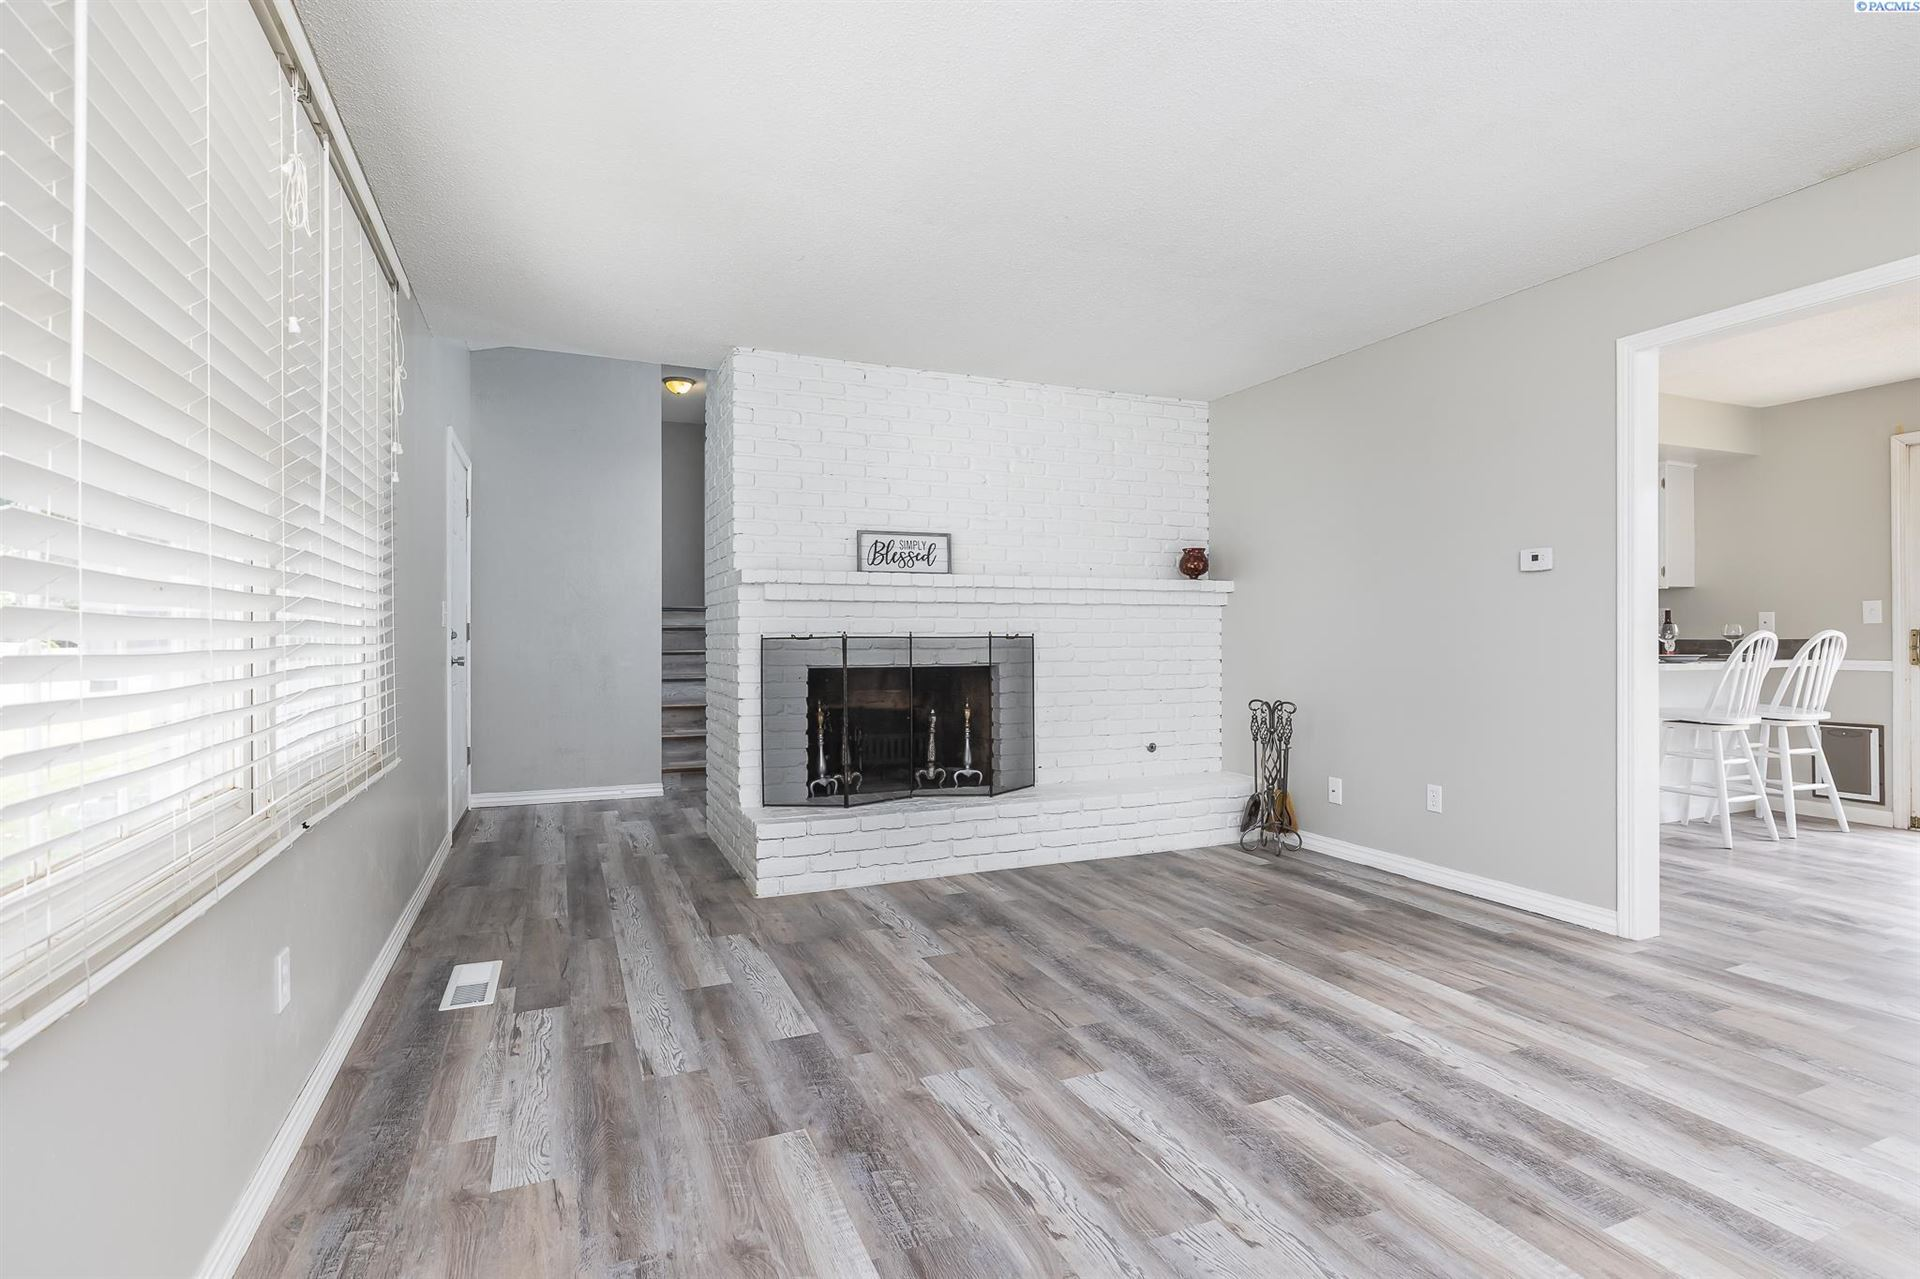 Photo of 2900 S Garfield St, Kennewick, WA 99337 (MLS # 254381)